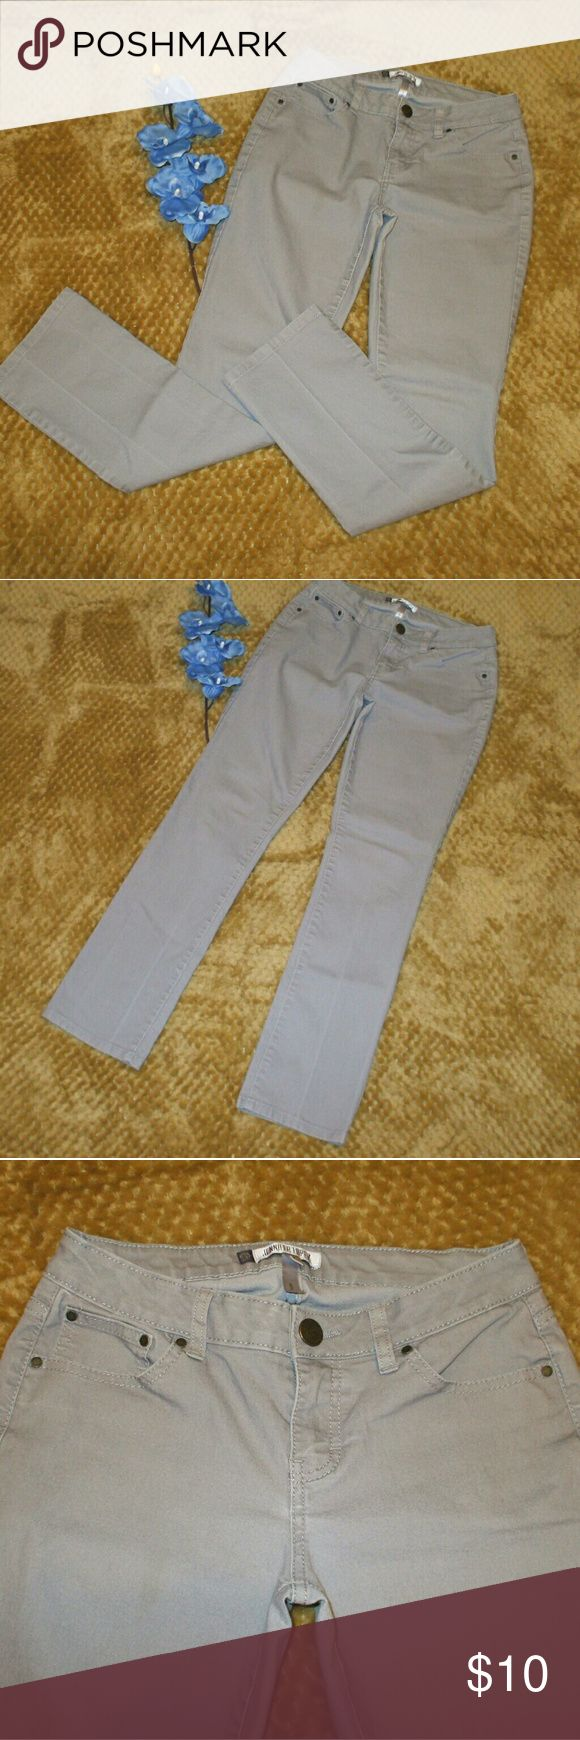 Jennifer Lopez Gray Straight Leg Jeans Gray denim - Straight leg - 76% cotton, 22% polyester, 2% spandex - Beautiful pre-owned condition - smoking home Jennifer Lopez Jeans Straight Leg